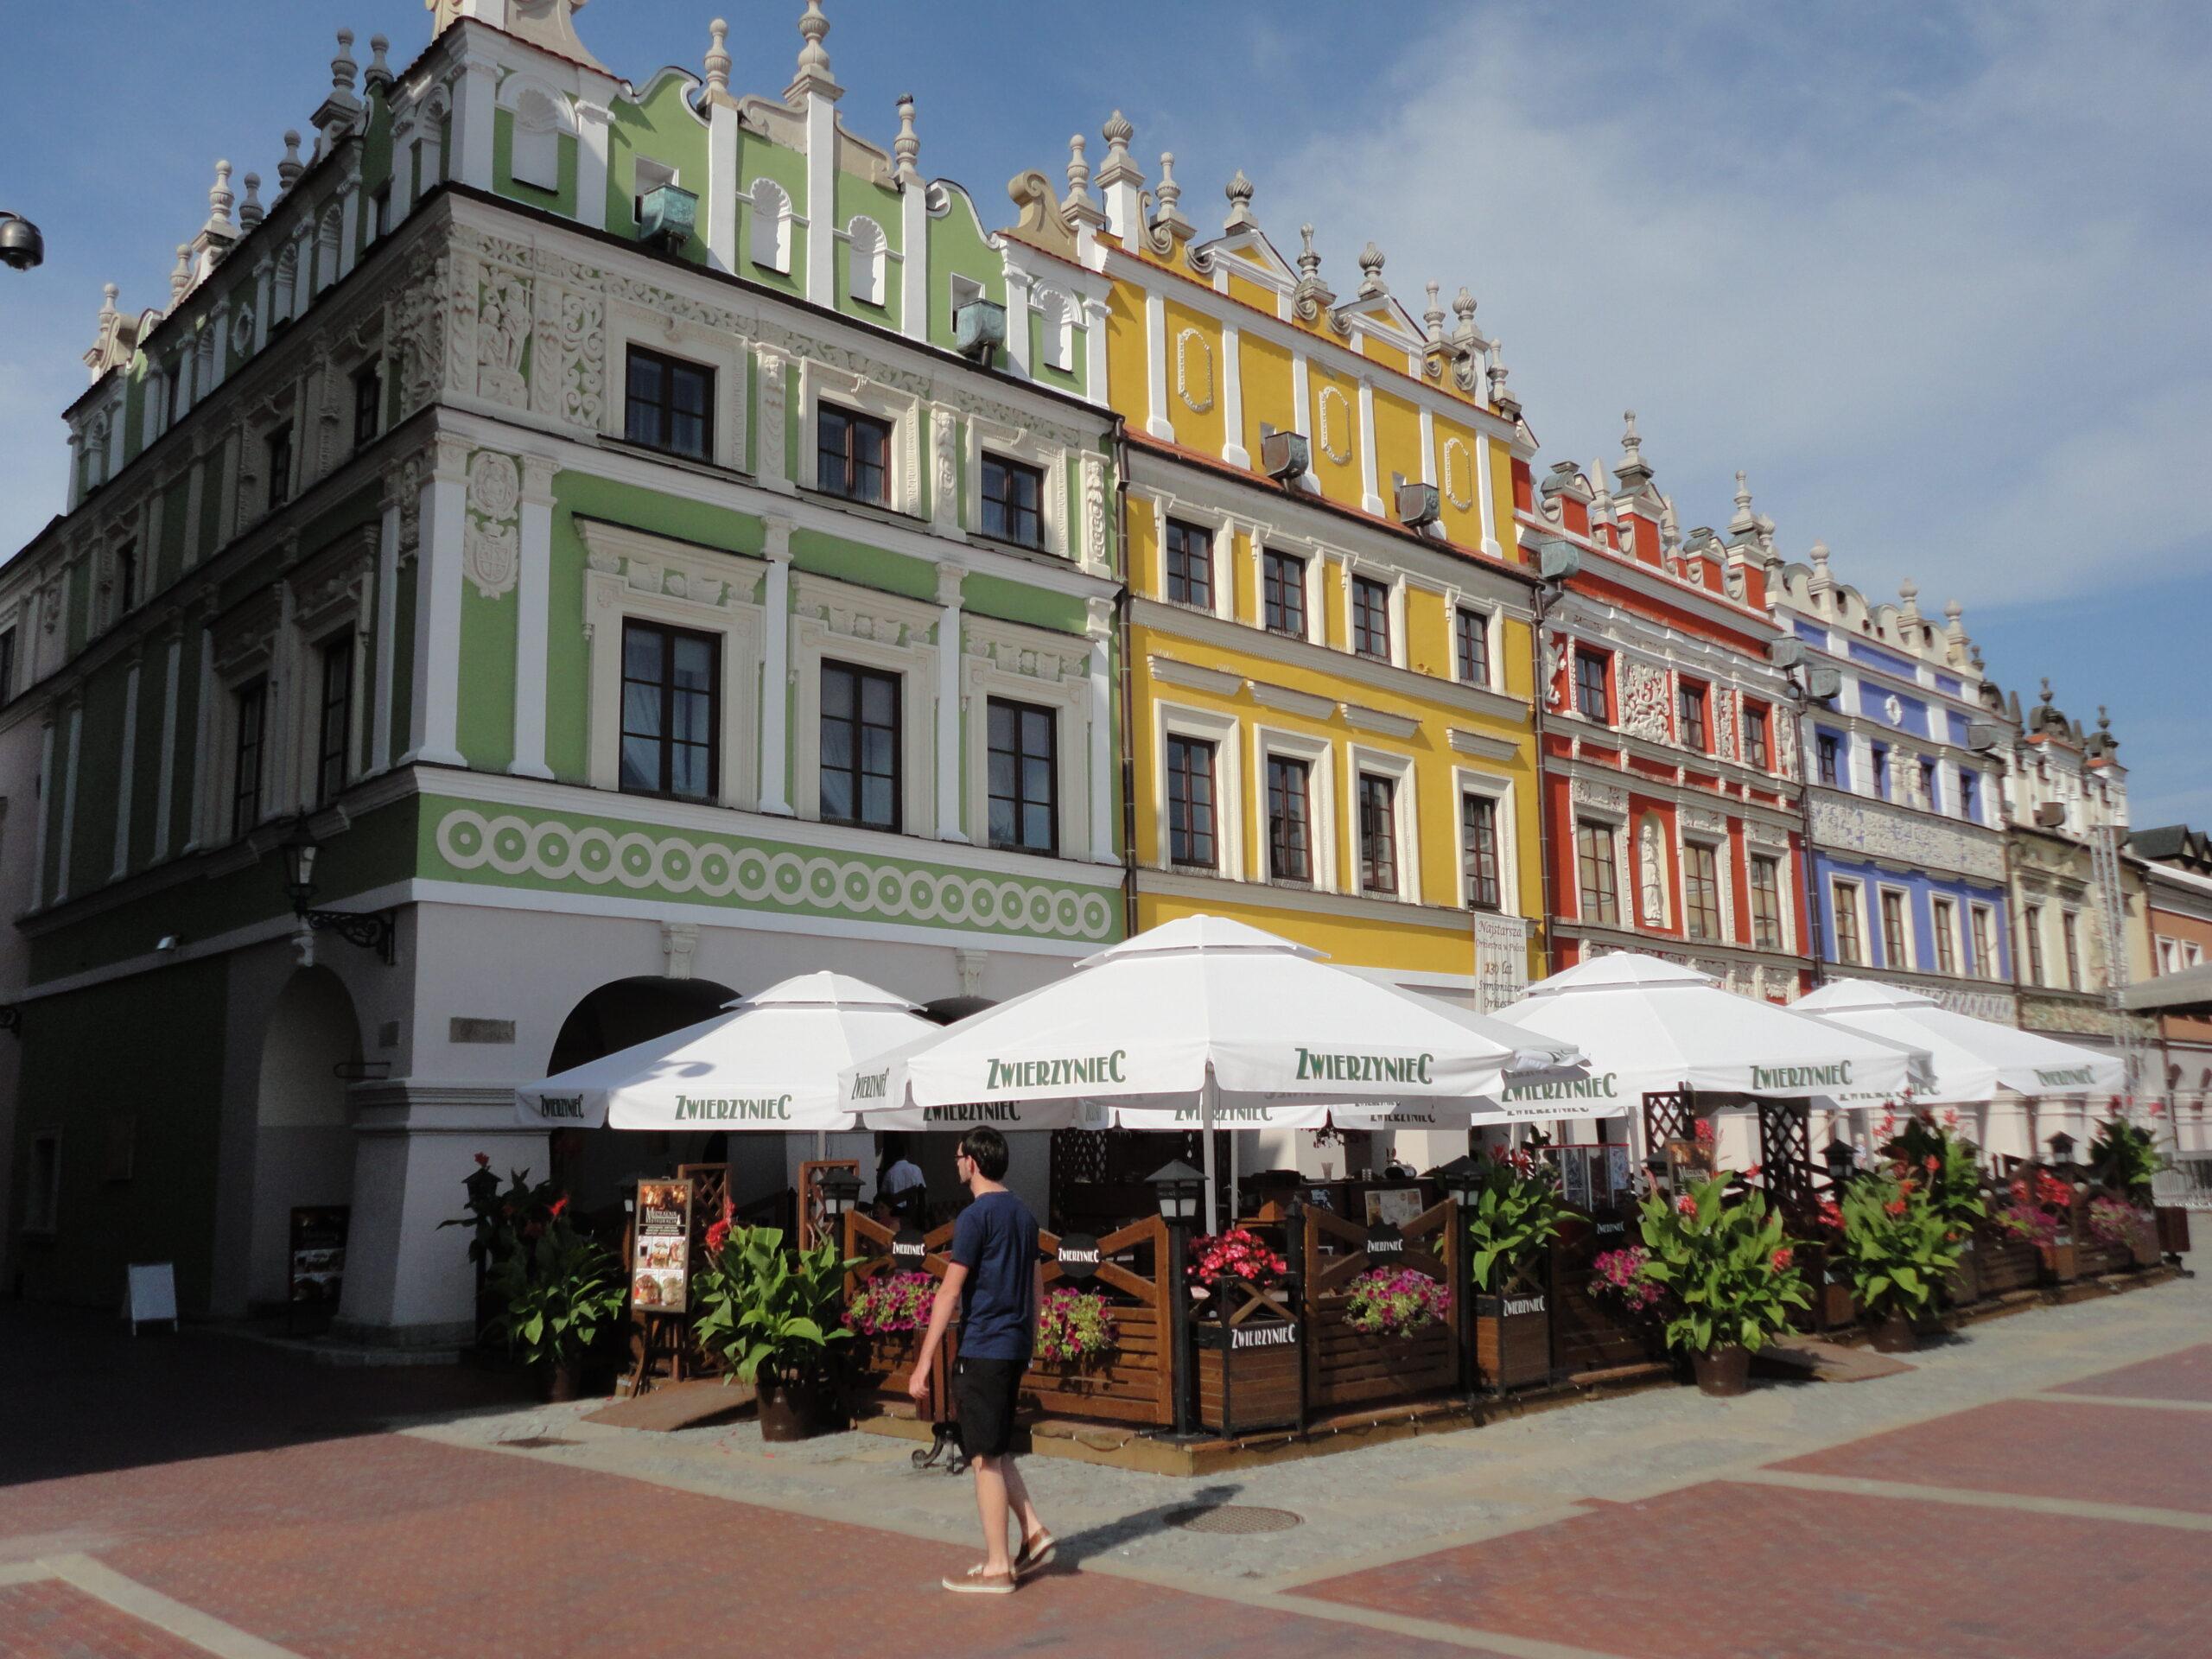 Polish ancestry Polish heritage